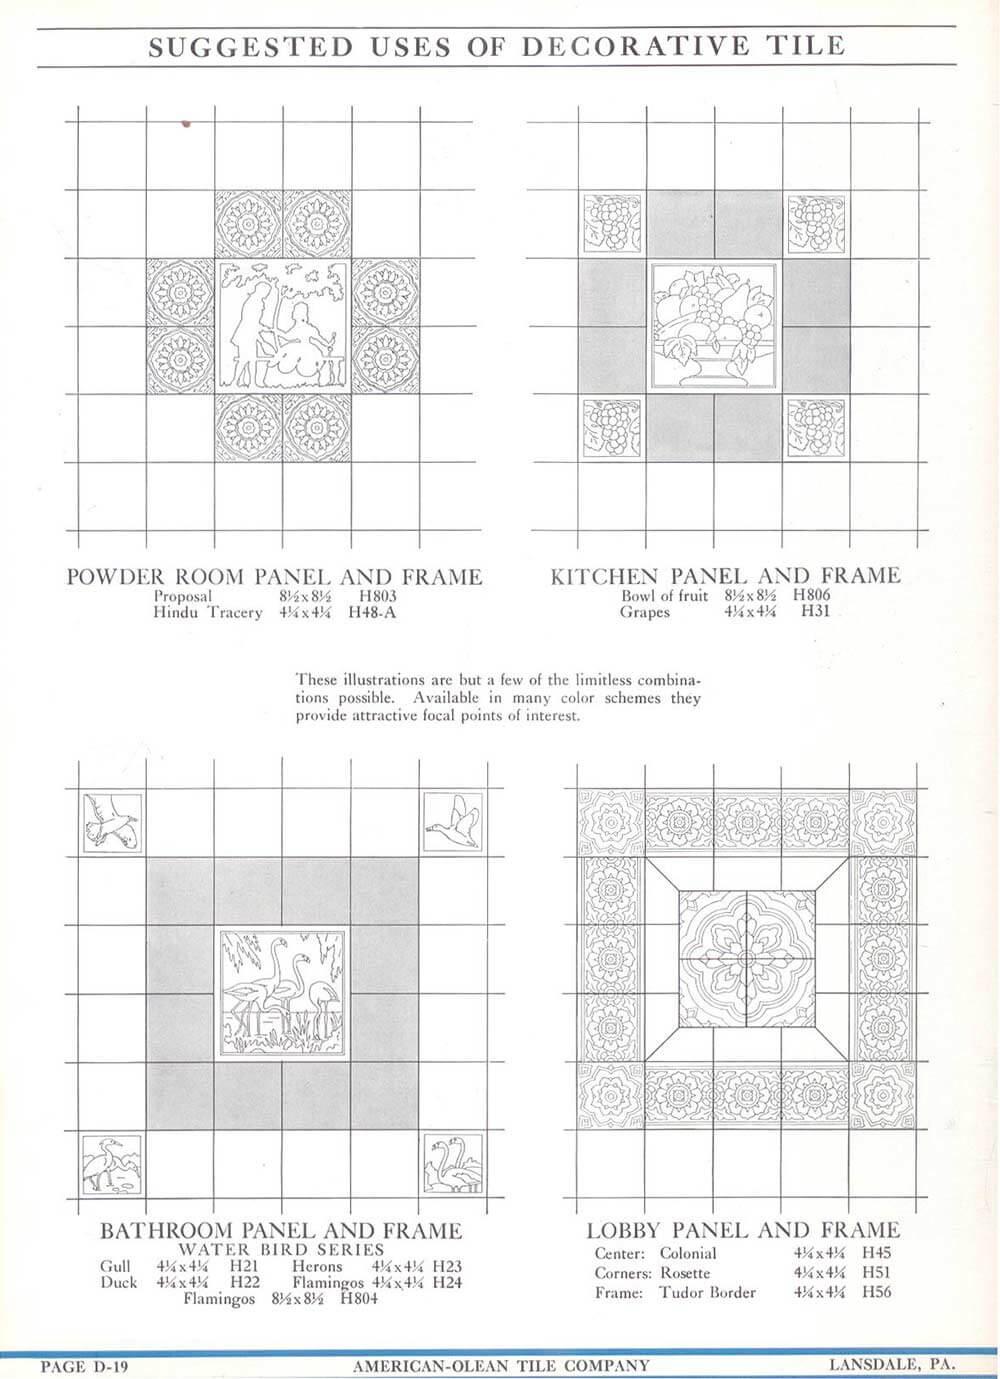 American-Olean-decorative-tile-uses